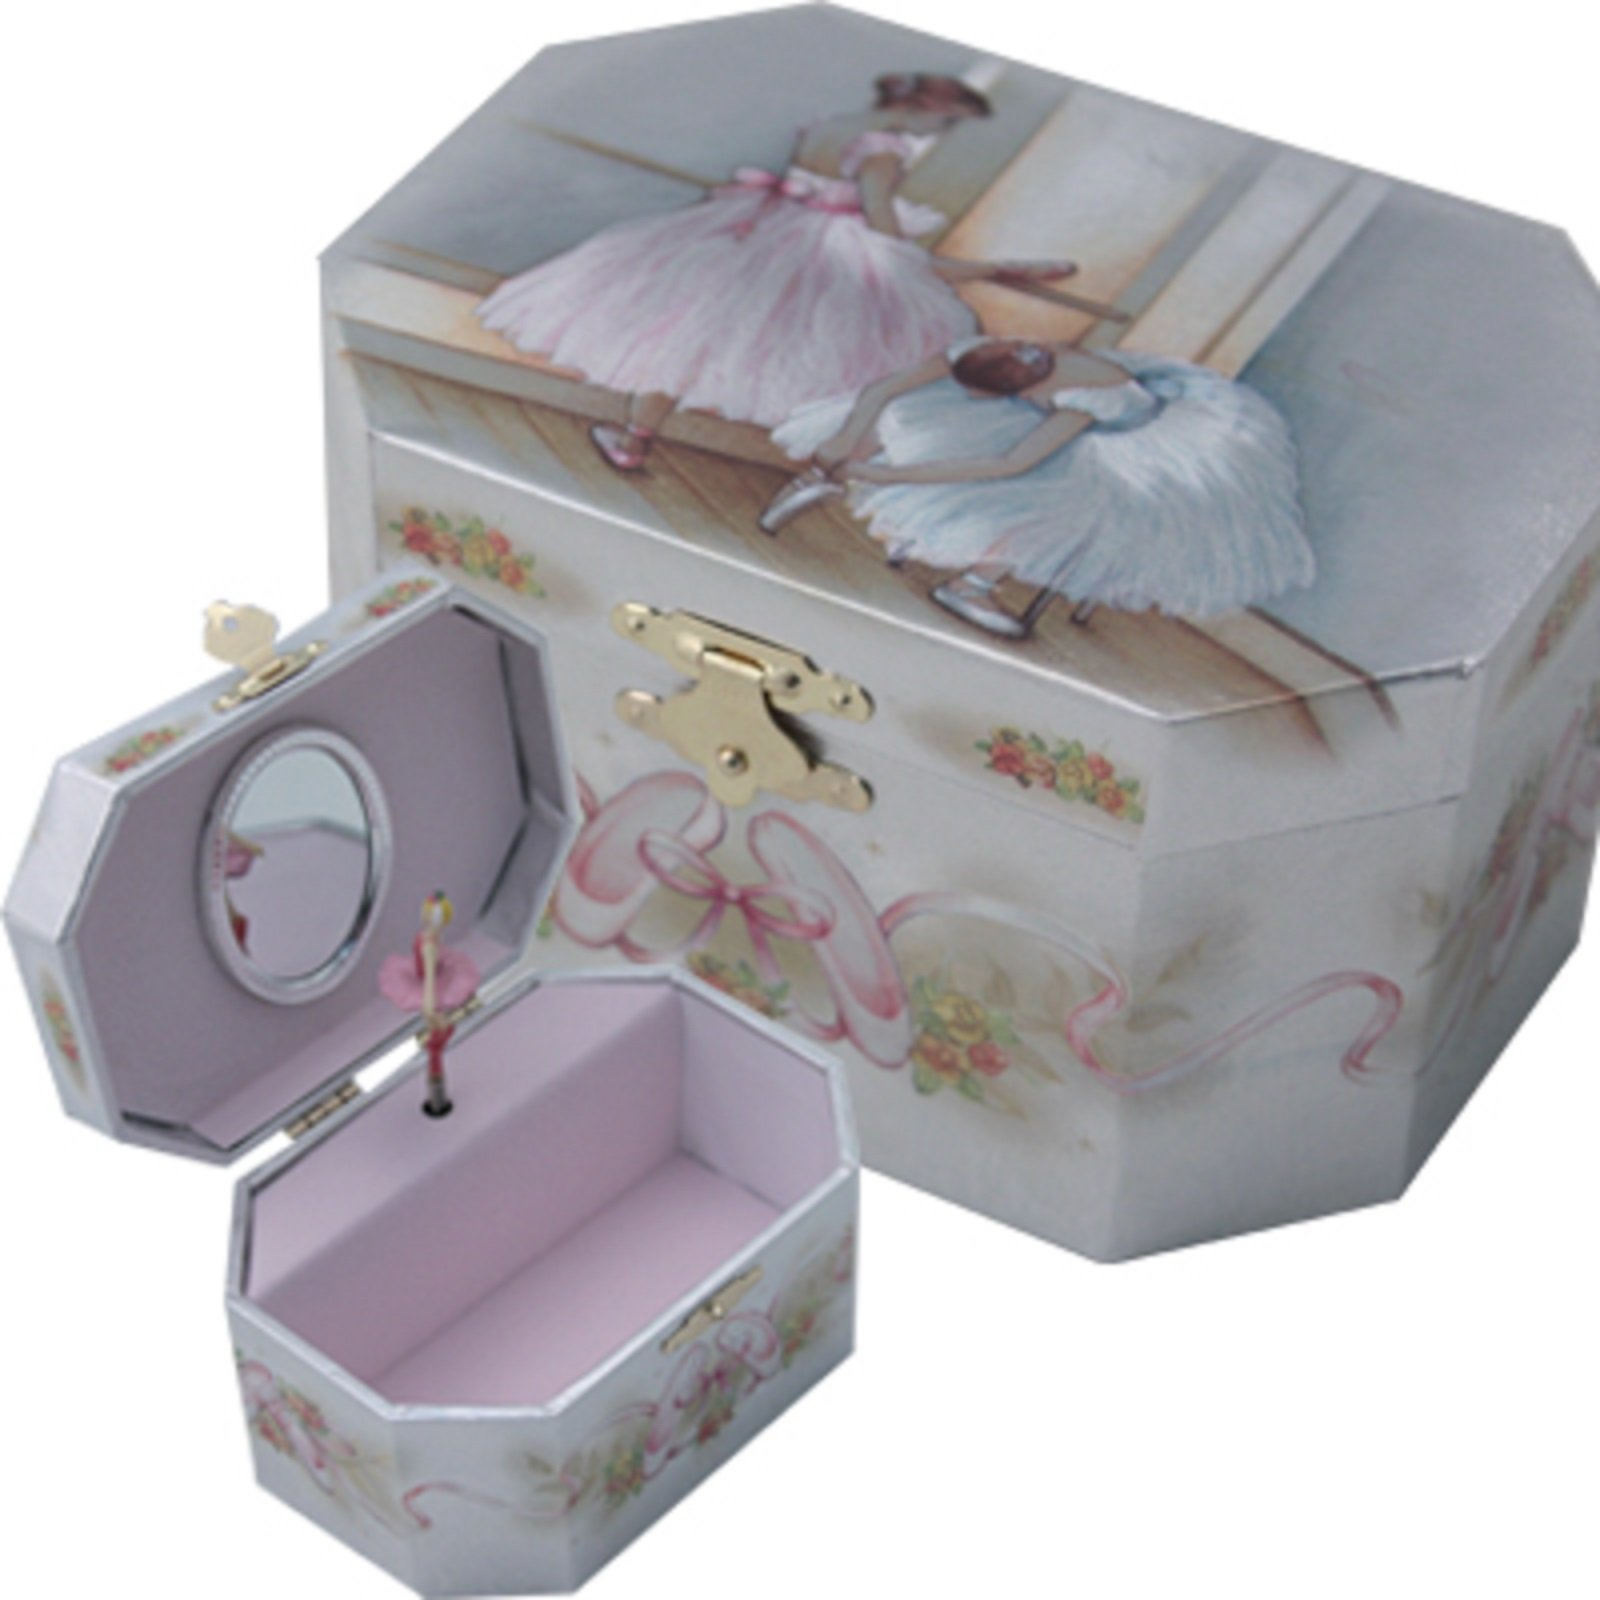 Ballerina Jewelry Music Box-Wooden material (Wood)